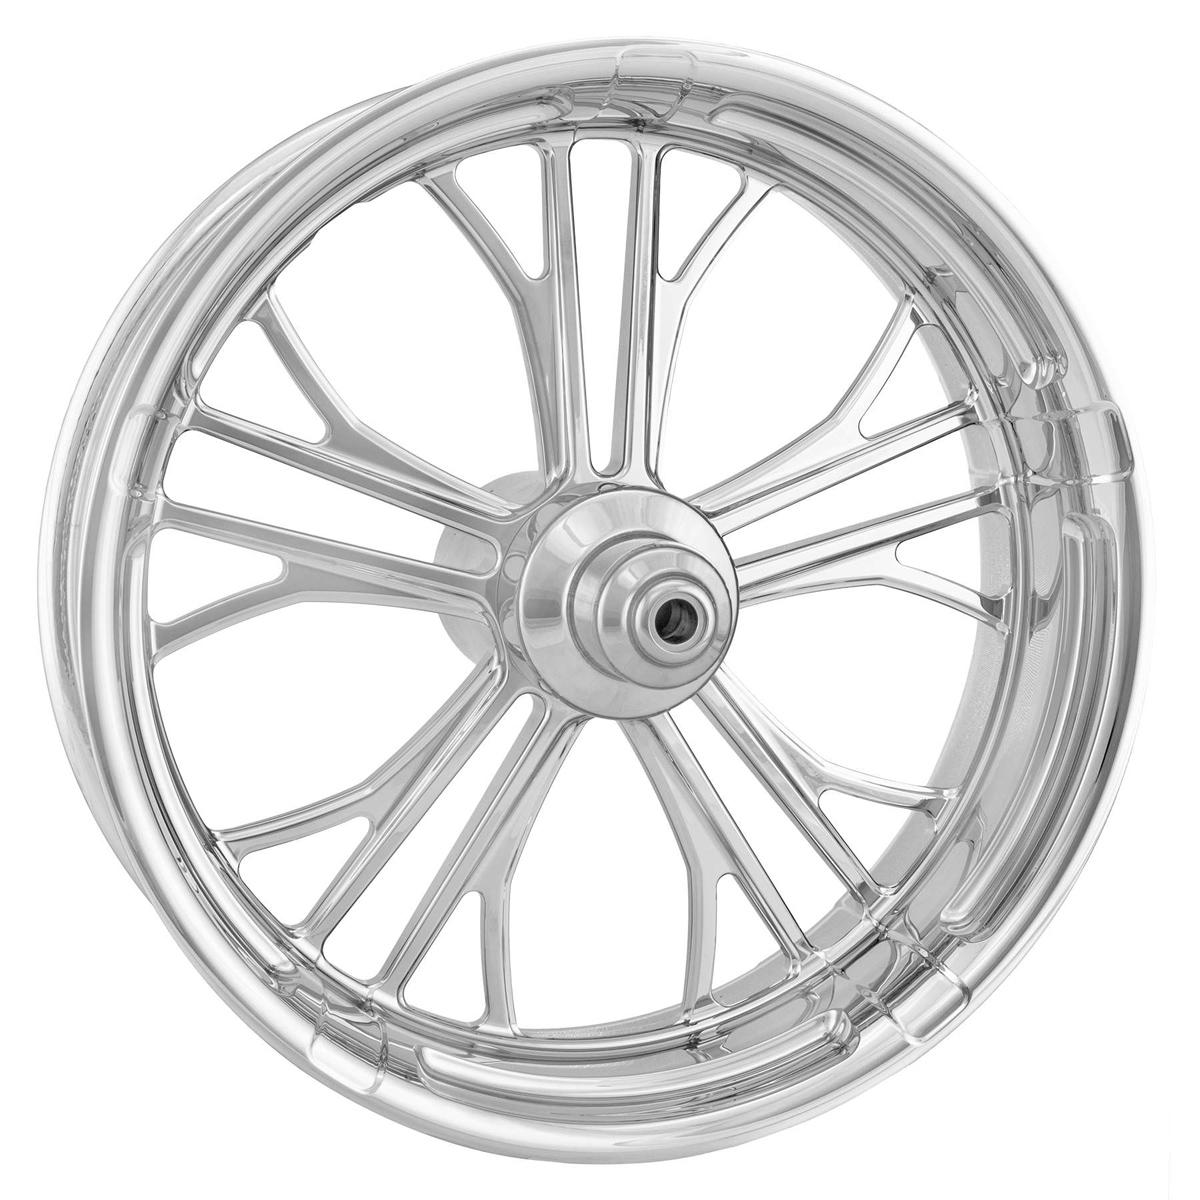 Performance Machine Dixon Chrome Front Wheel 21 x 2.15